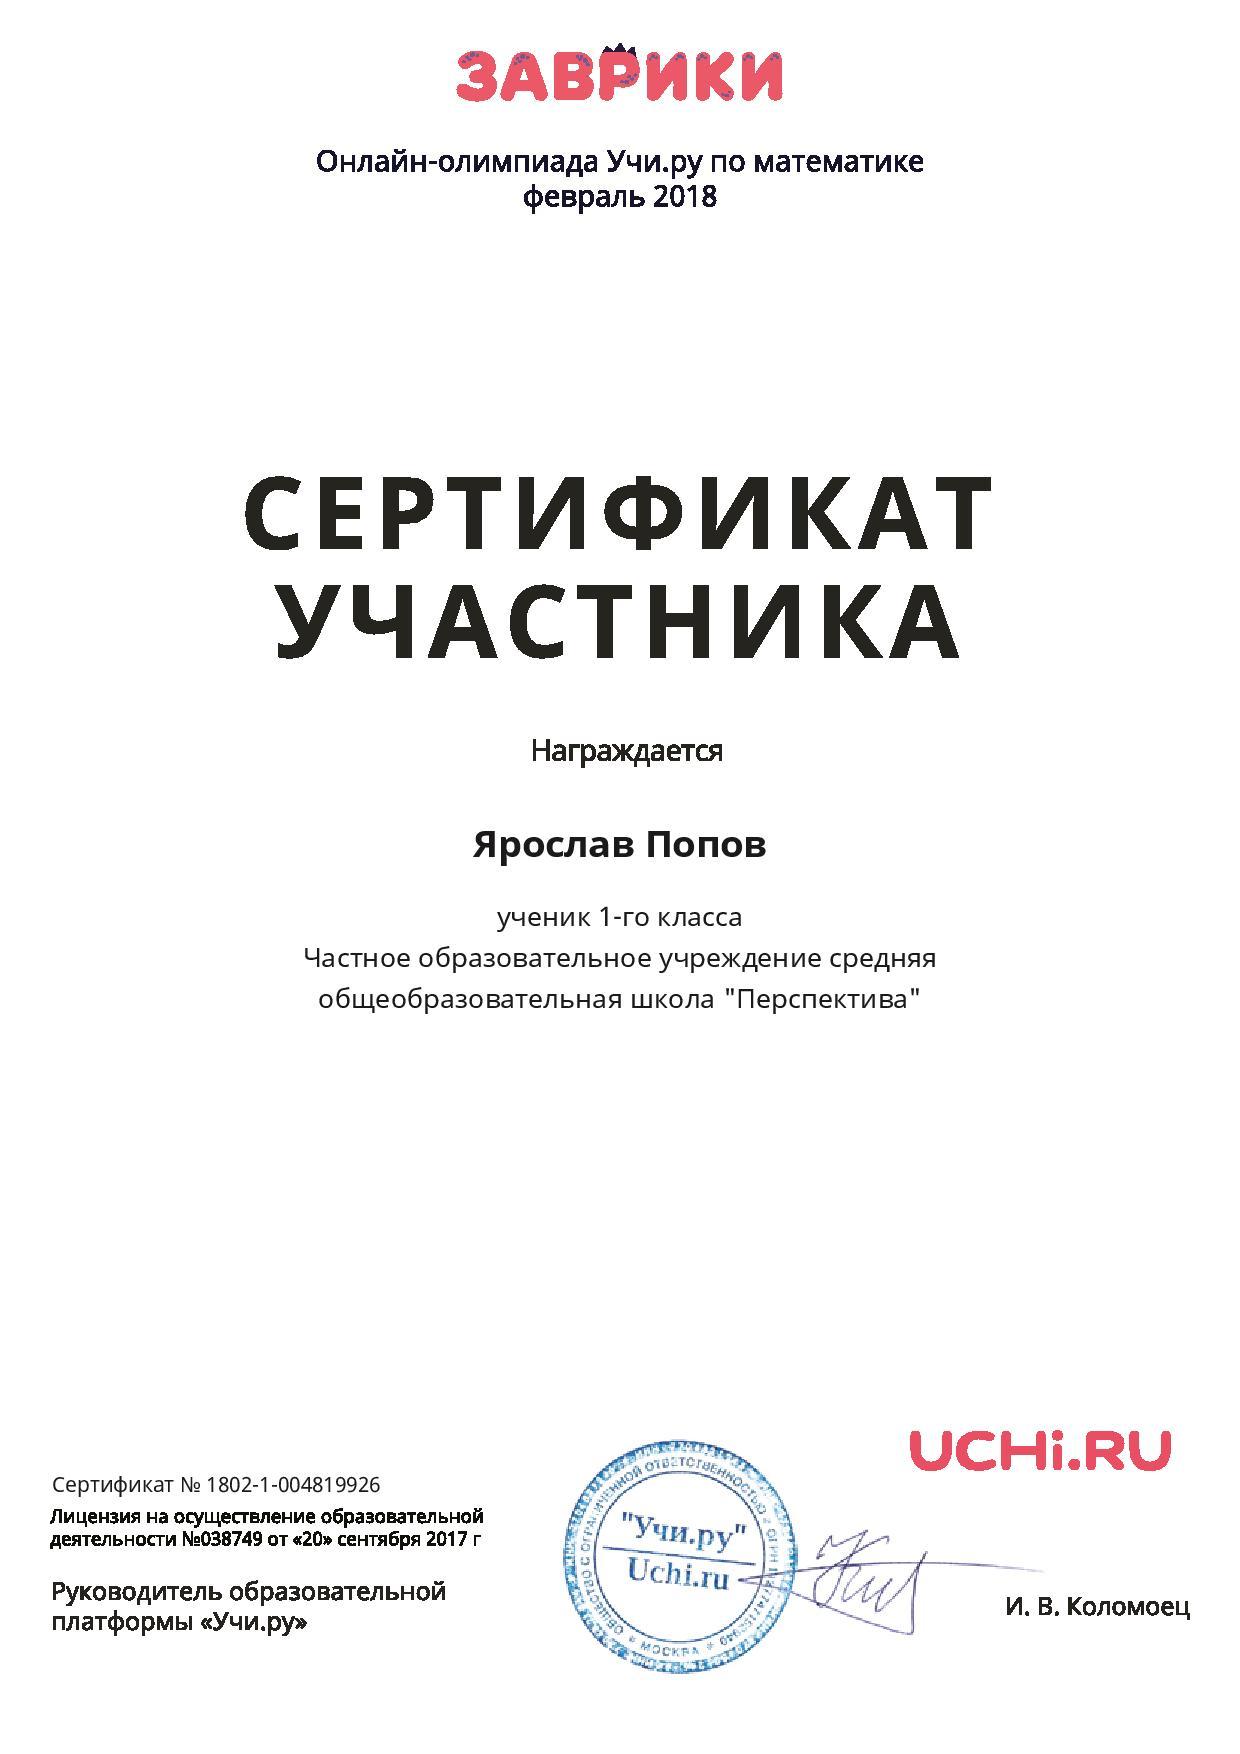 Sertifikat_Yaroslav_Popov_4835366-page-001